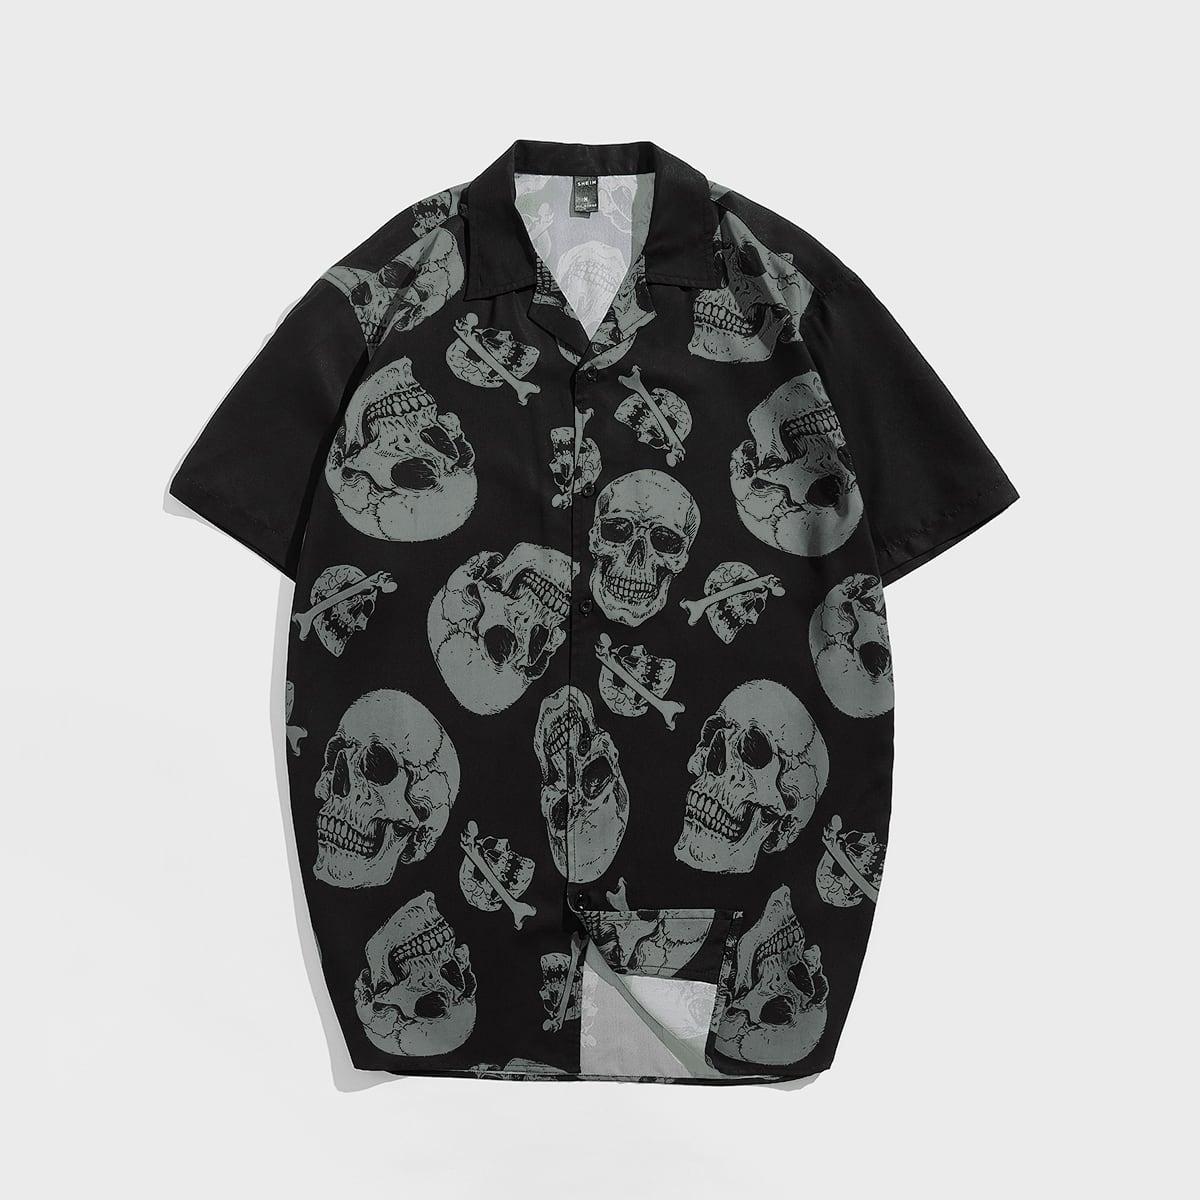 Мужской Рубашка с принтом скелета